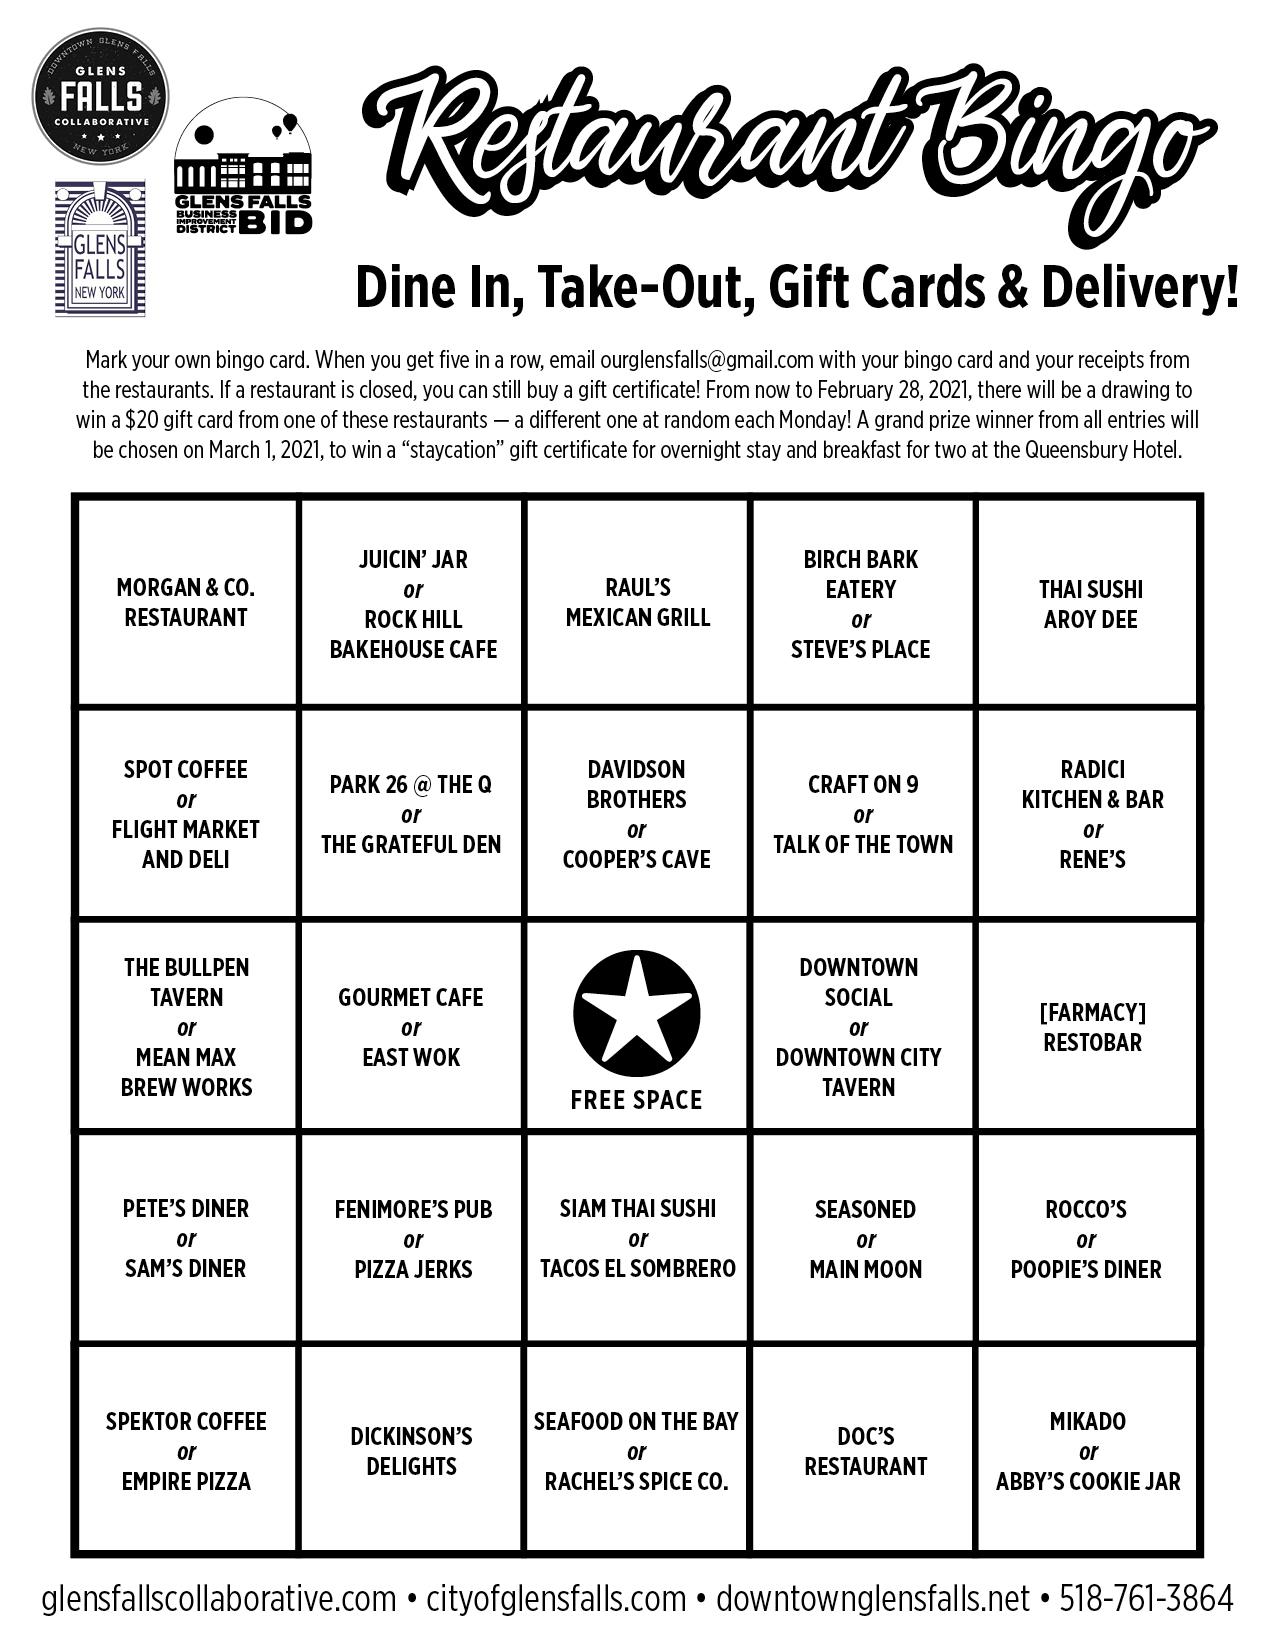 'Restaurant Bingo' organized to bring more traffic to Glens Falls eateries